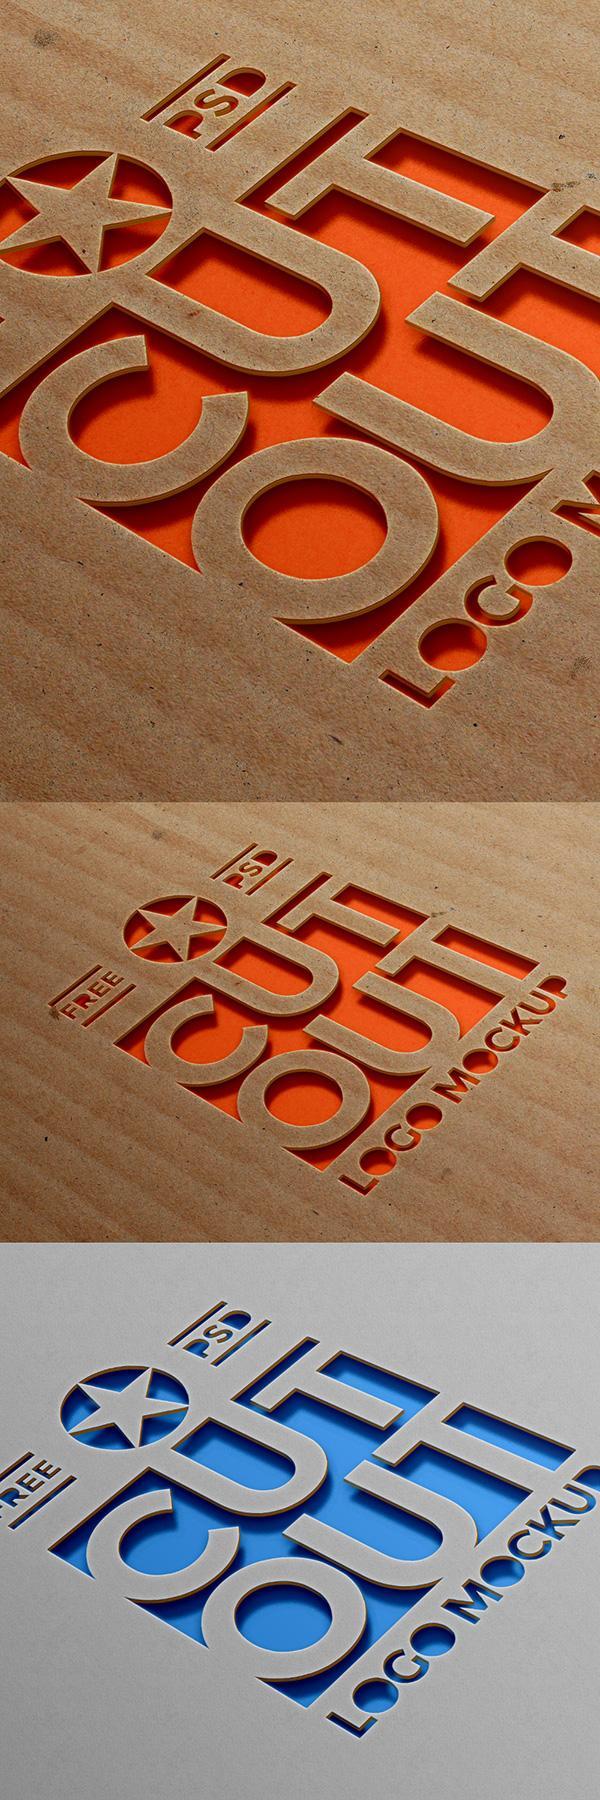 cardboard_cutout_logo_mockup